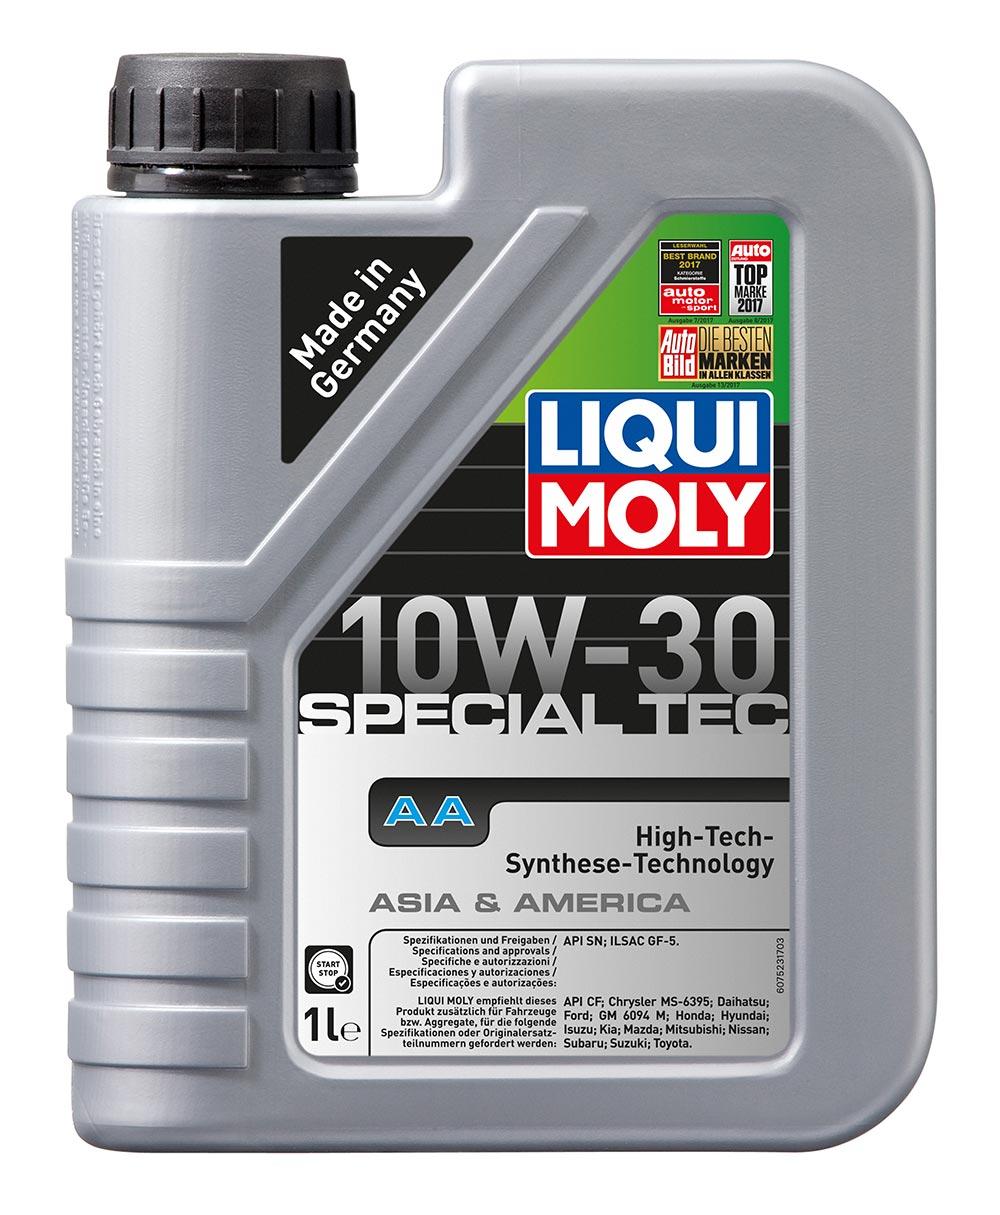 спец. для американских и японских авто.  LM  Leichtlauf Special AA 10w30   1л (1